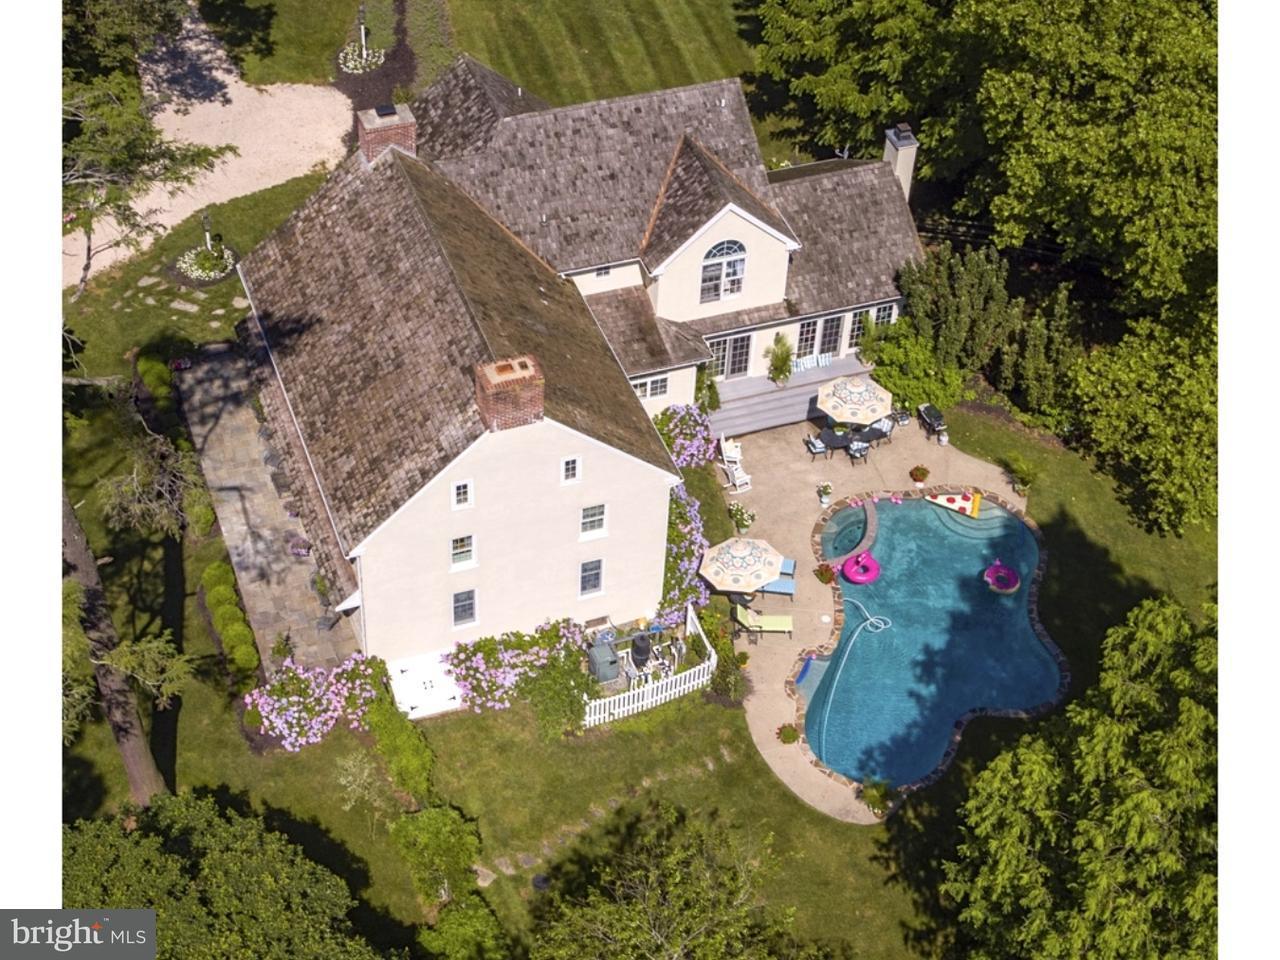 Single Family Home for Sale at 231 E DOE RUN Road Kennett Square, Pennsylvania 19348 United States